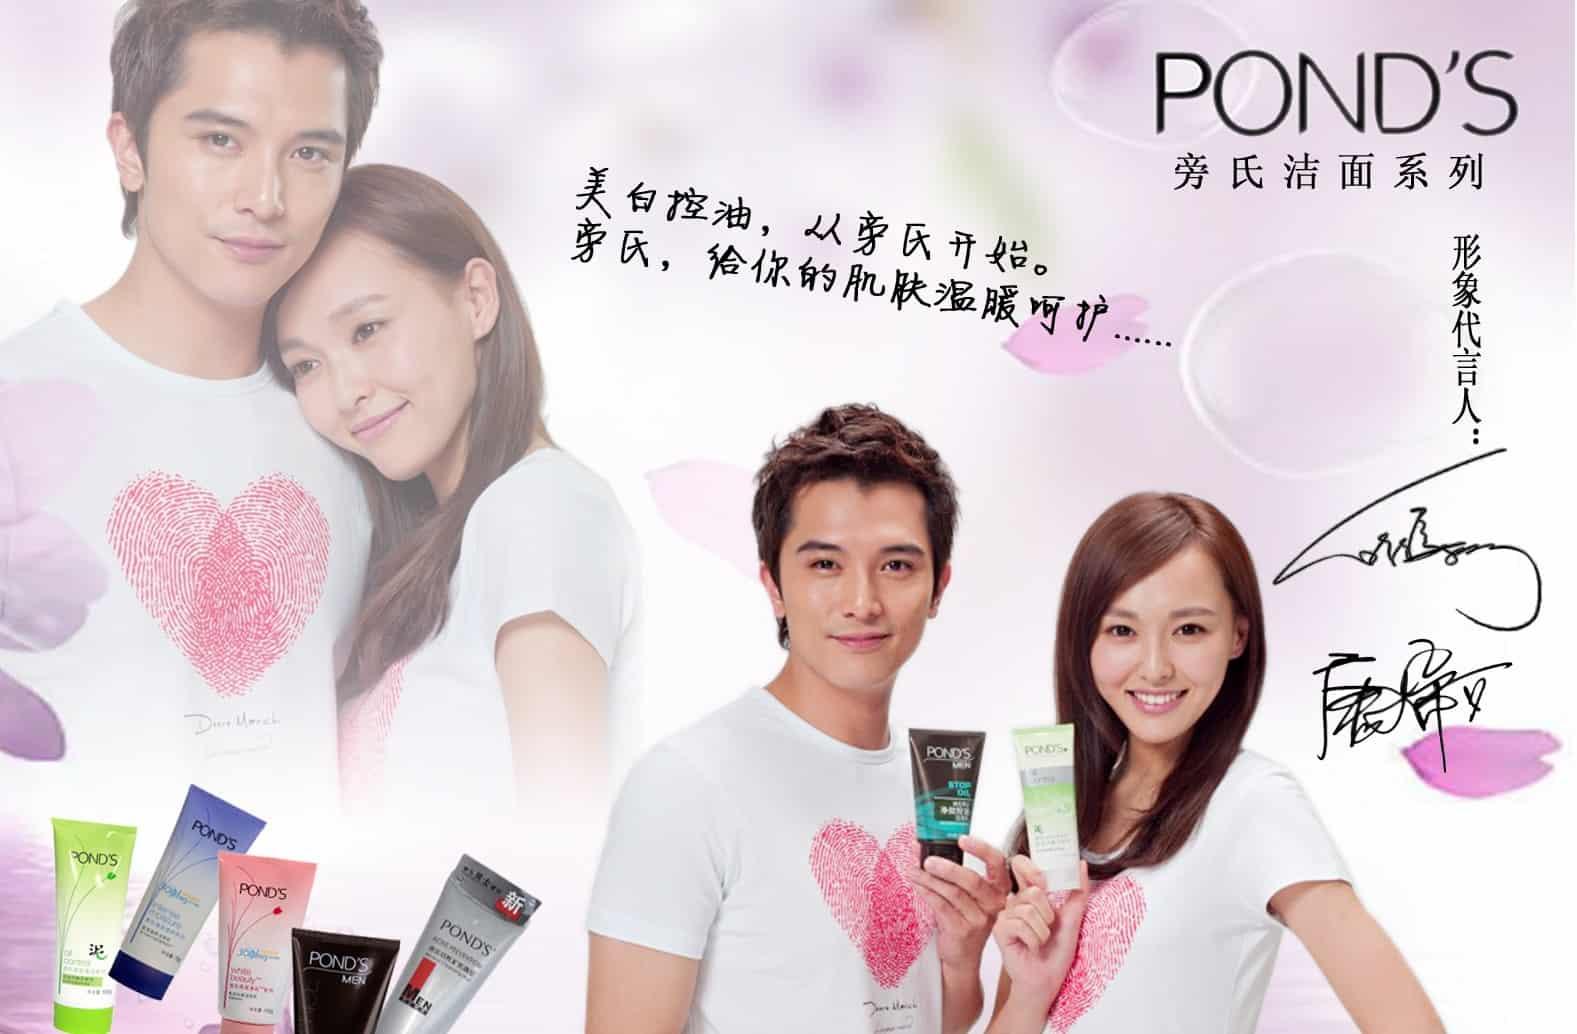 Ponds celebrates the Chinese Valentine's Day